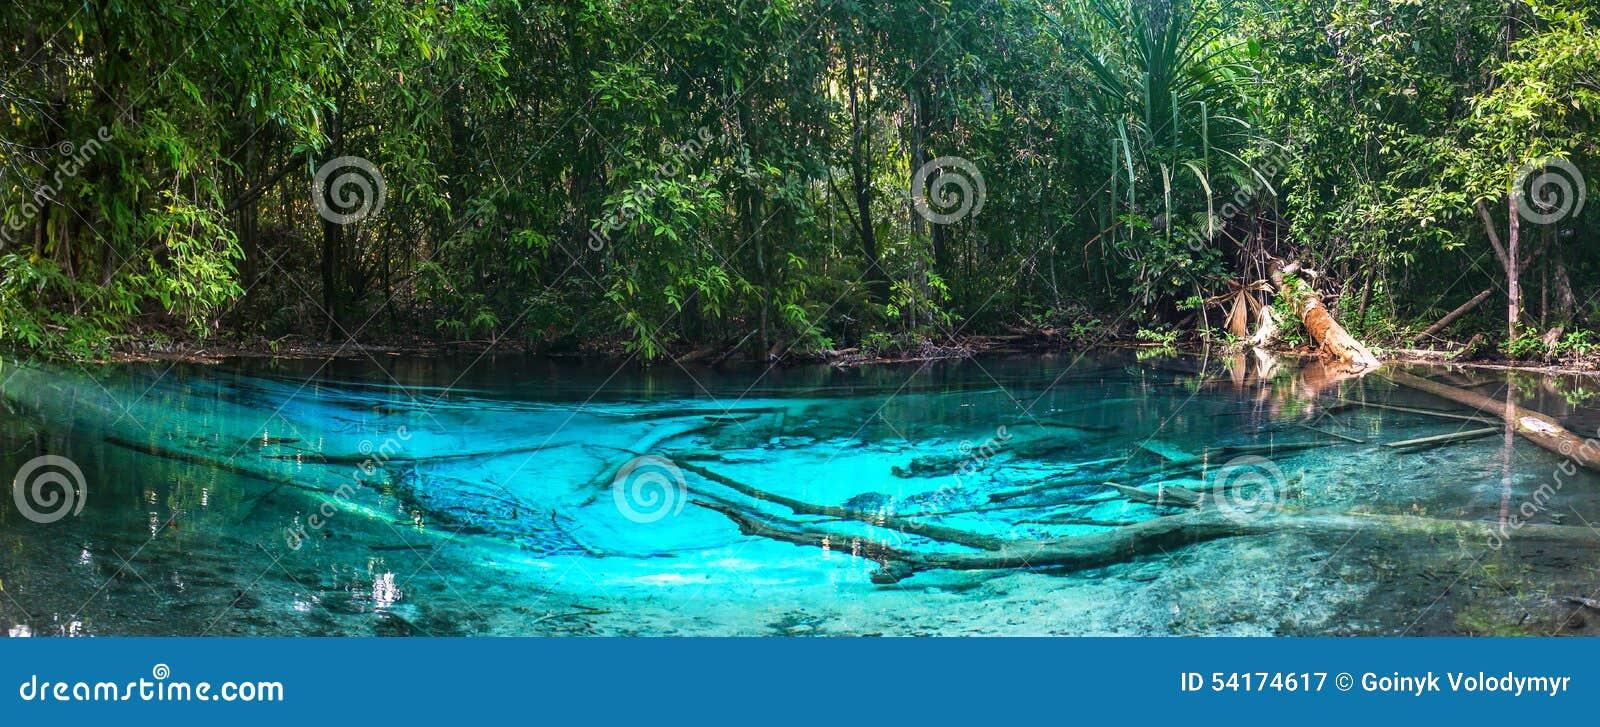 Piscine bleue verte krabi tha lande image stock image for Piscine a debordement thailande